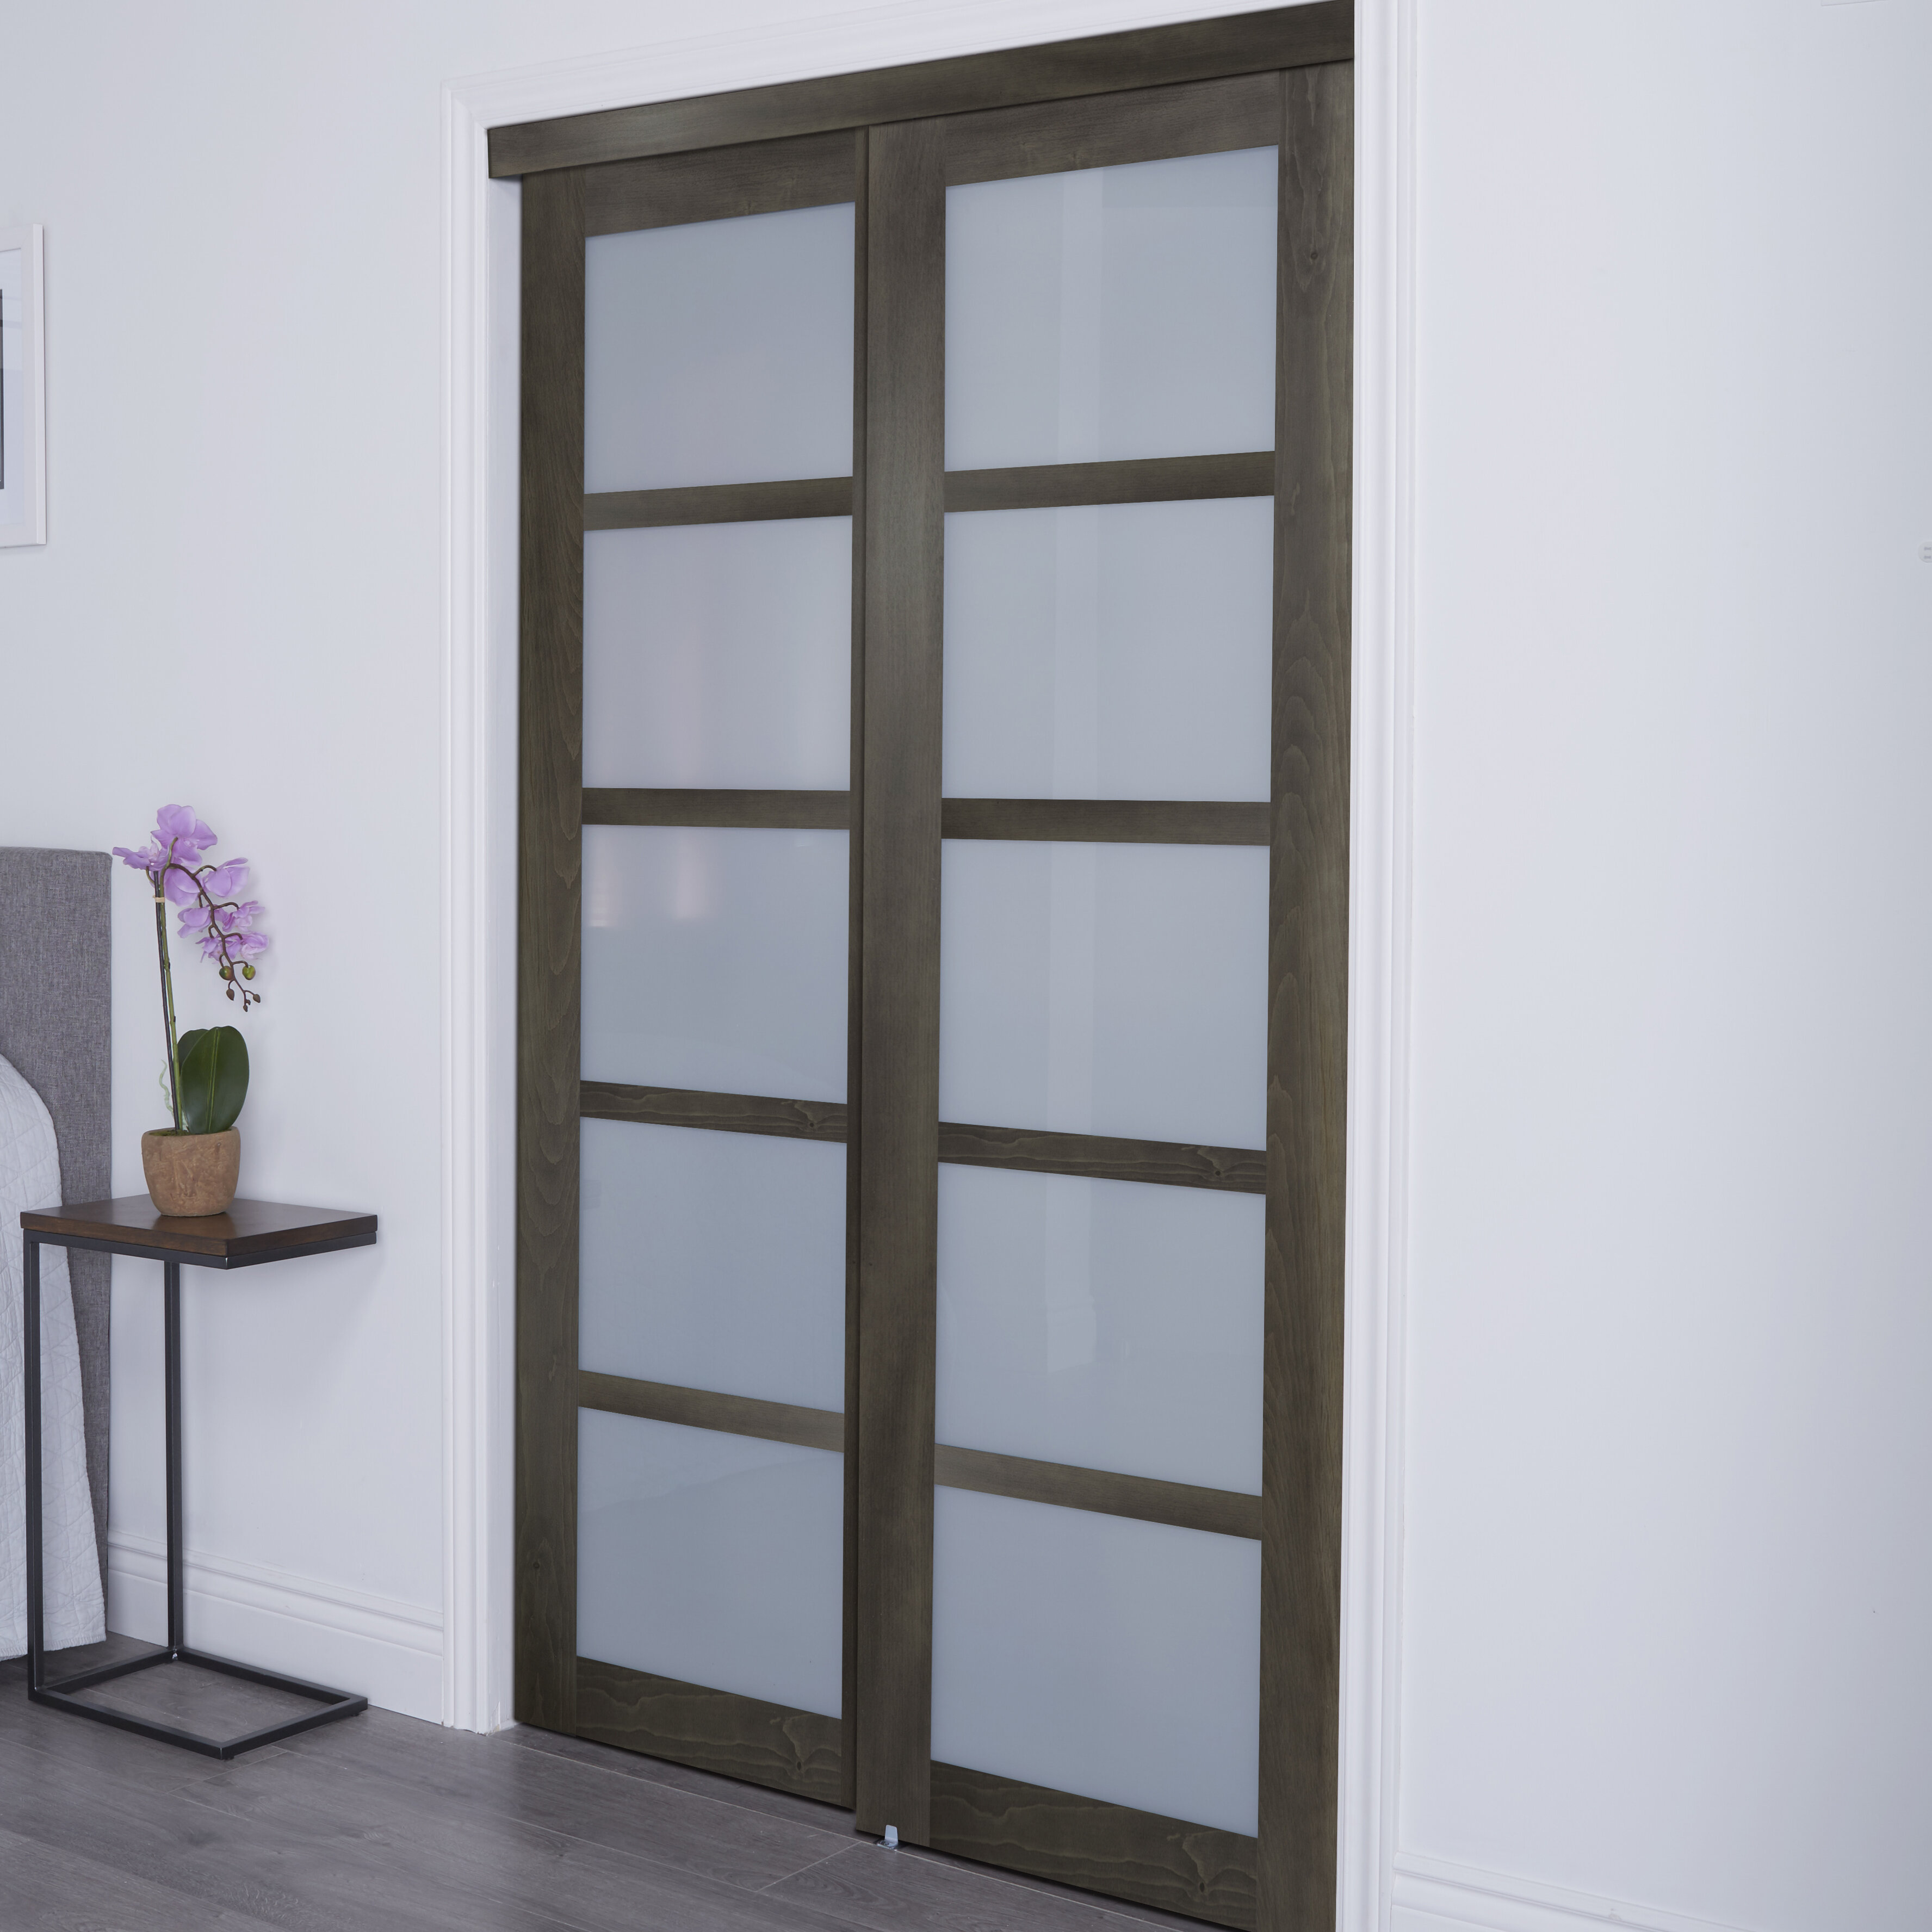 Baldarassario Glass Sliding Closet Doors With Installation Hardware Kit